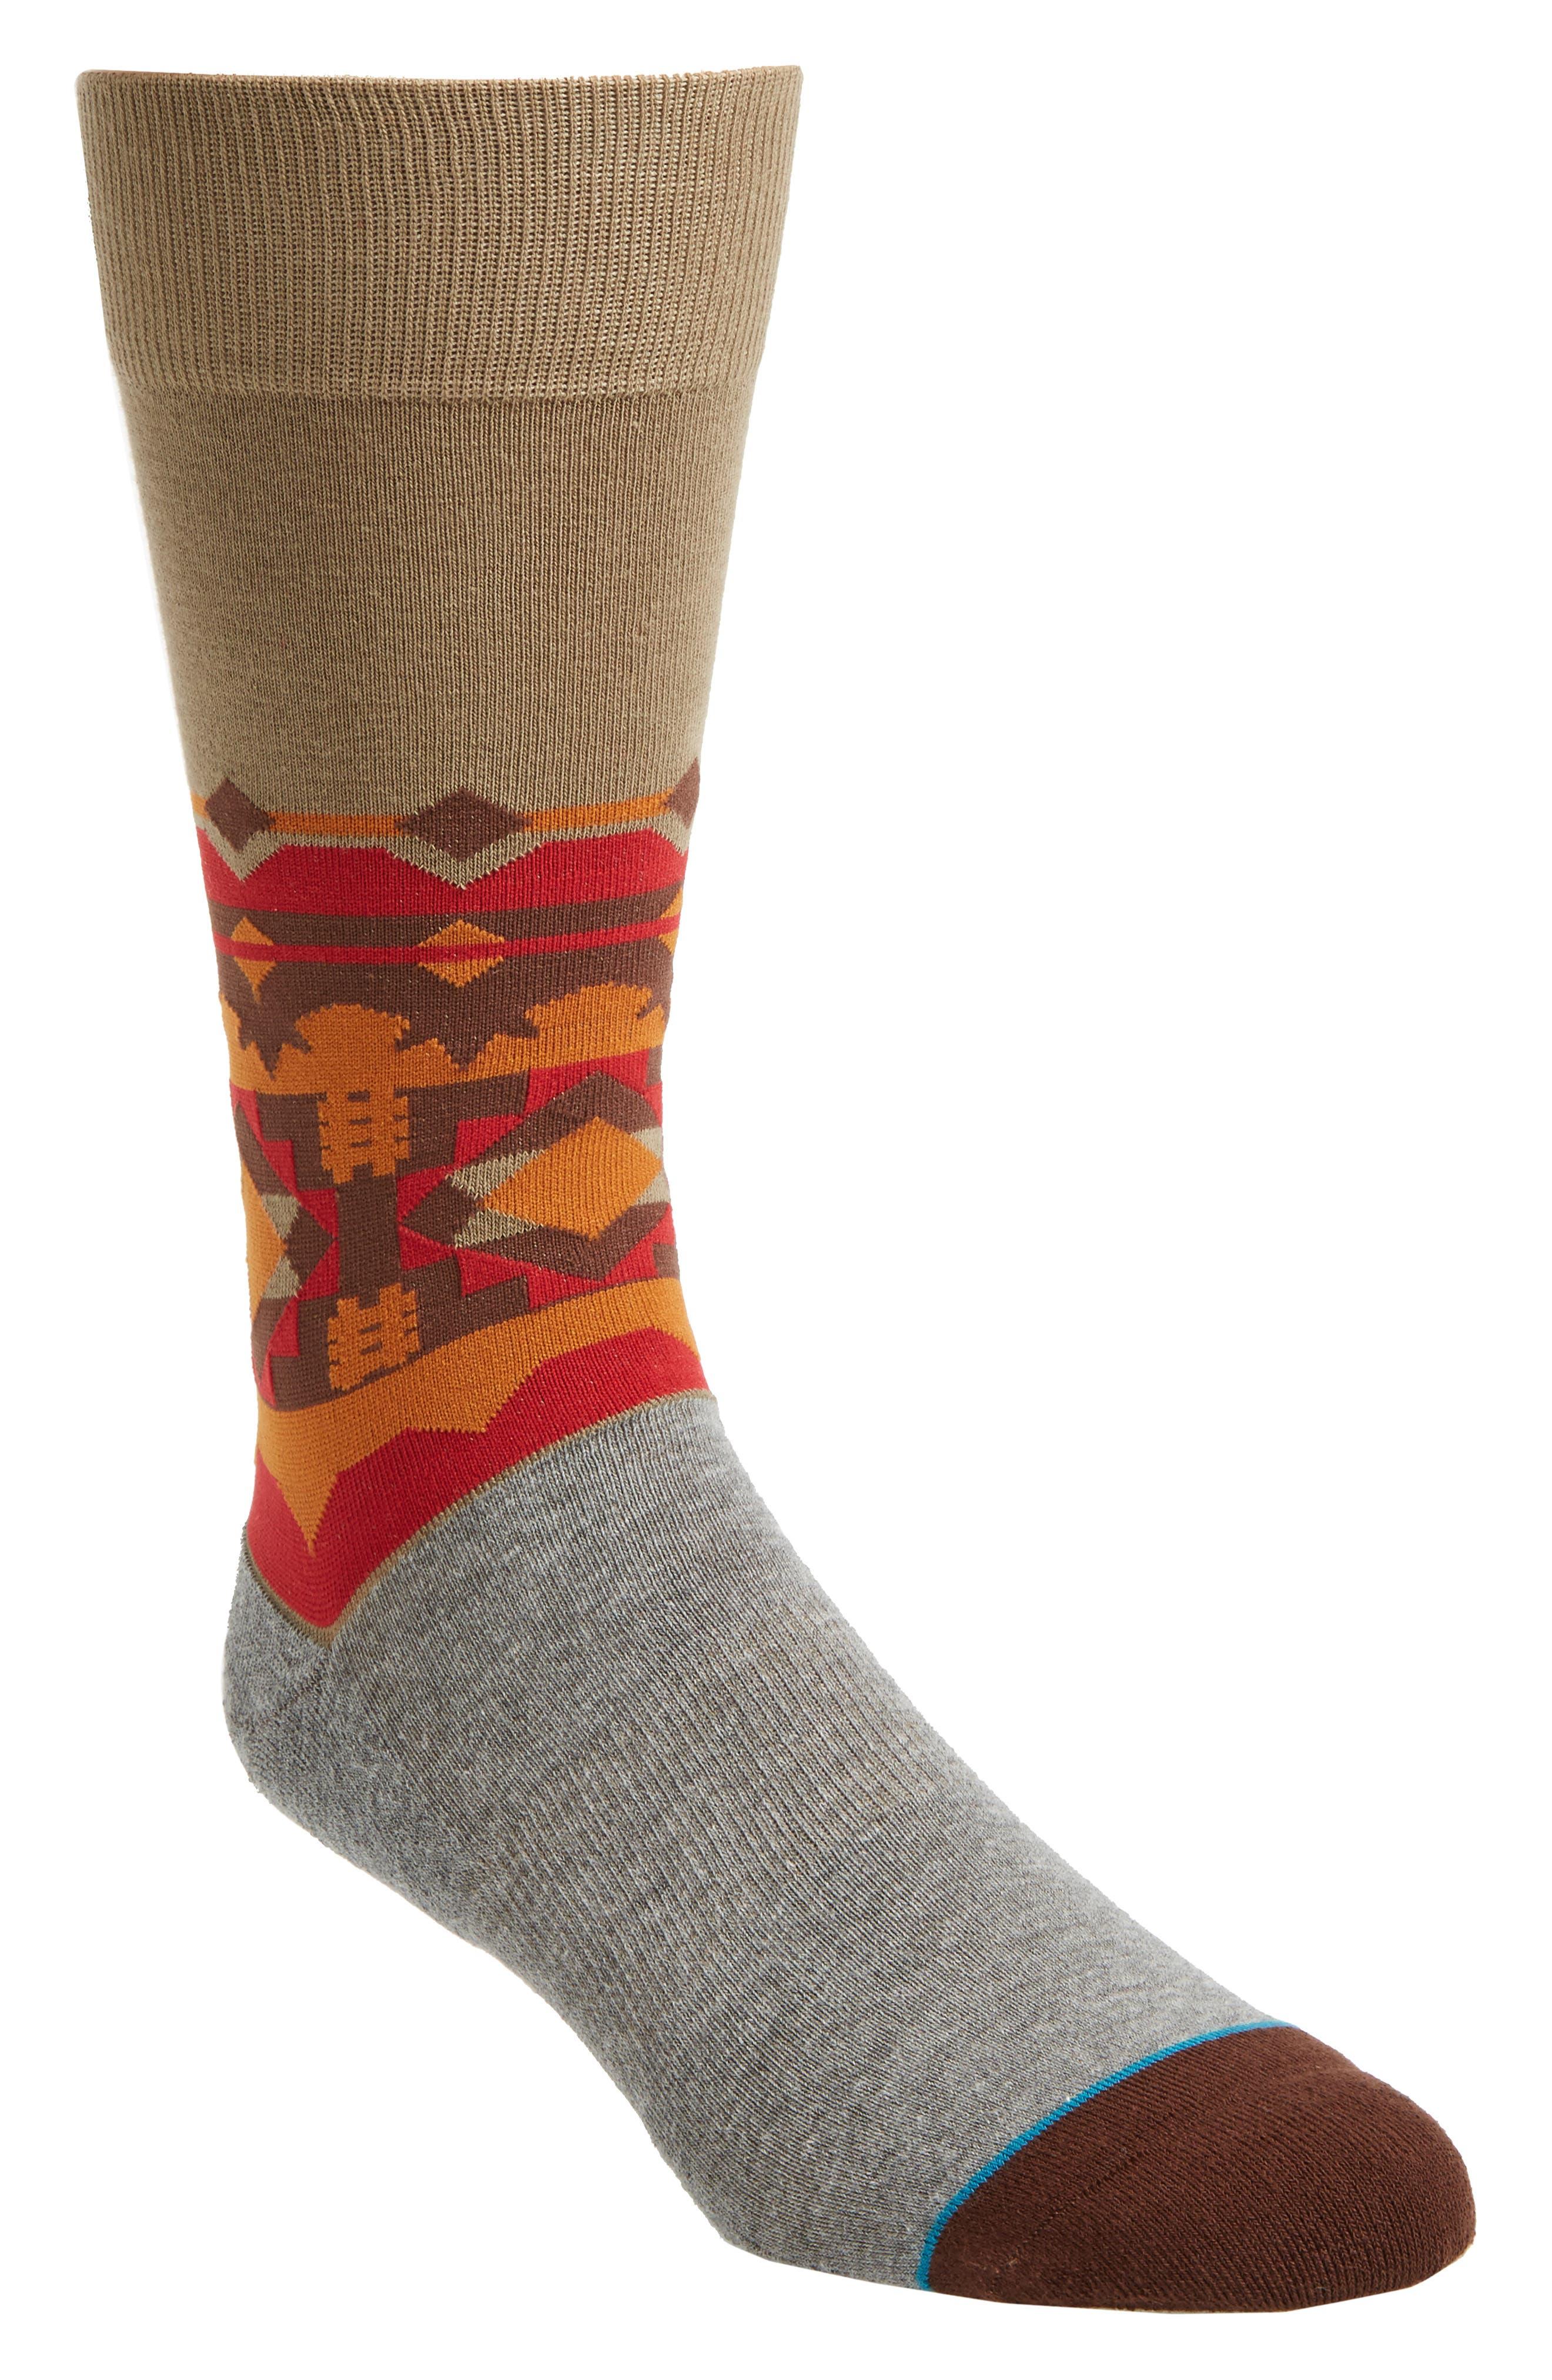 Main Image - Stance Sinaloa Socks